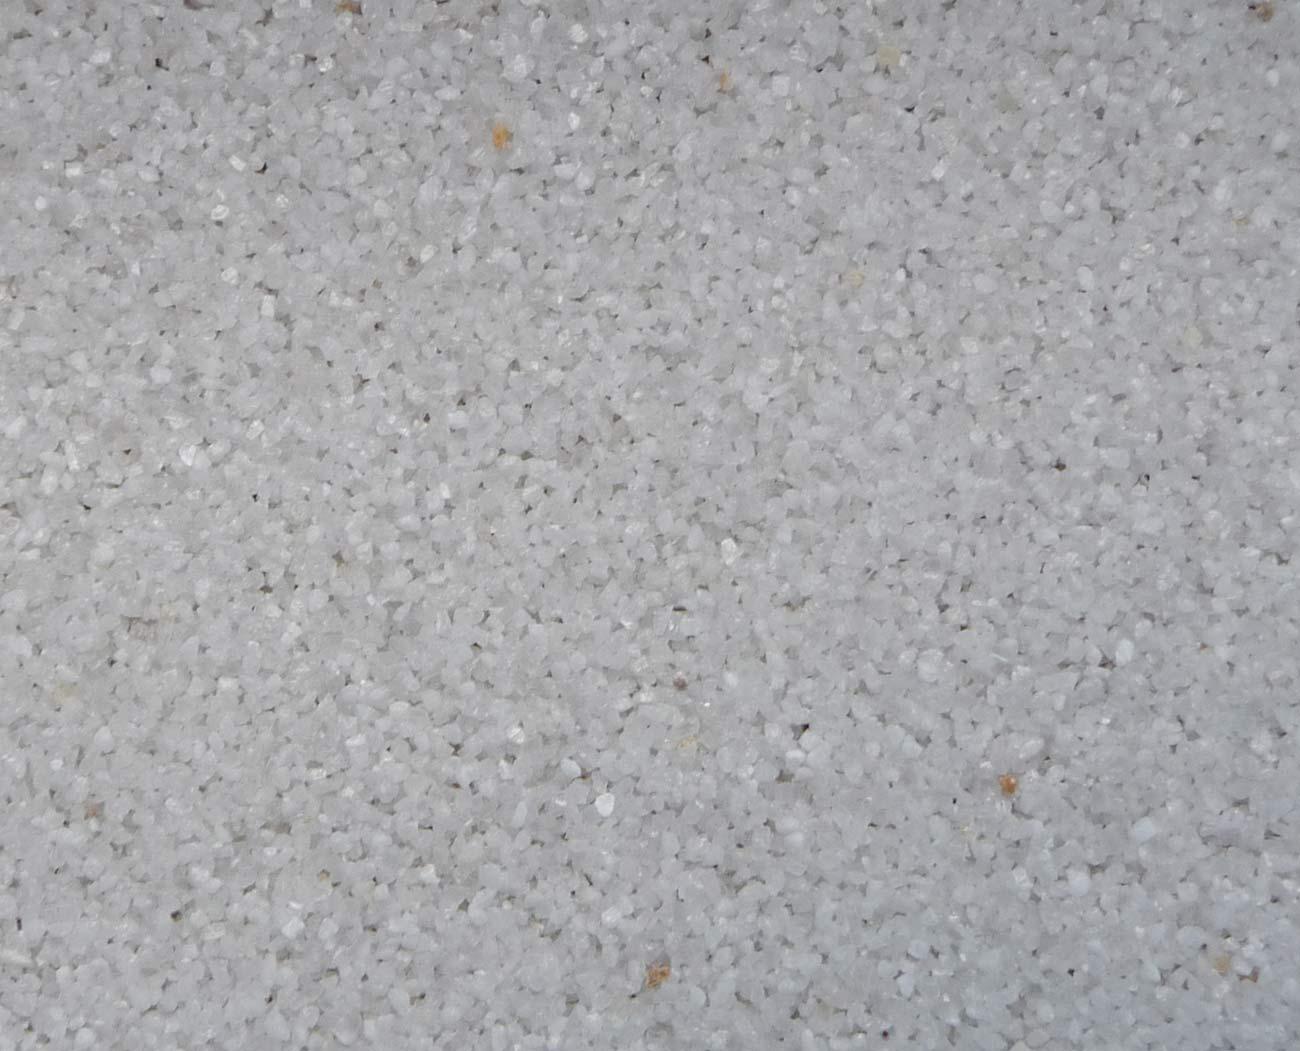 kristall buntsteinputz bietex 2 mm 25 kg sk 555k kristallweiss 1 59 euro kg ebay. Black Bedroom Furniture Sets. Home Design Ideas